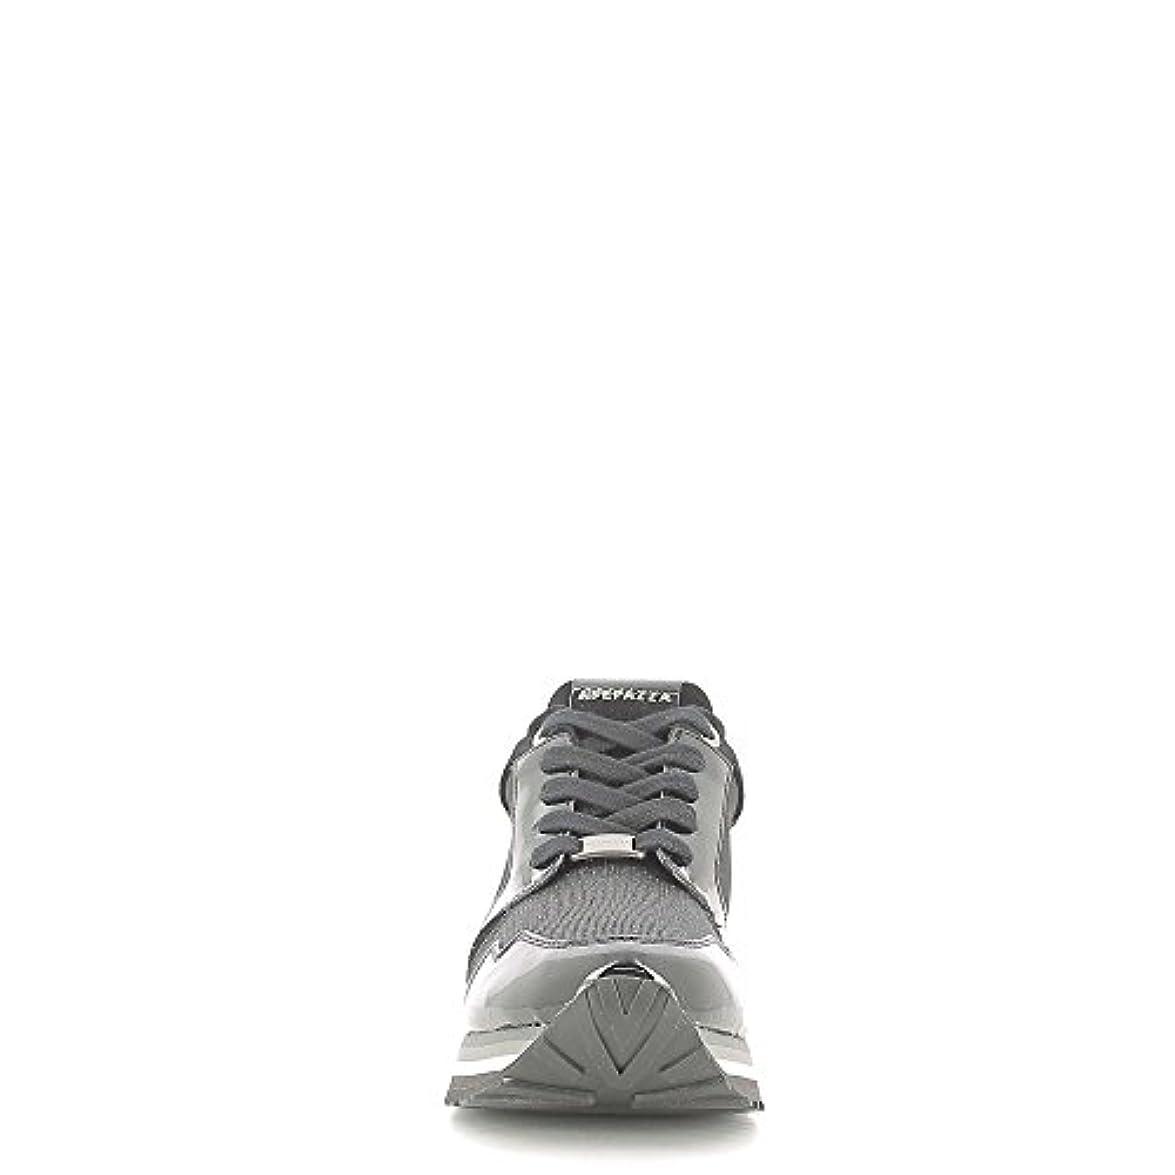 Apepazza Rihanna Metal Fabric Rsd01 Sneaker Vernice camoscio Zeppa Interna Nero